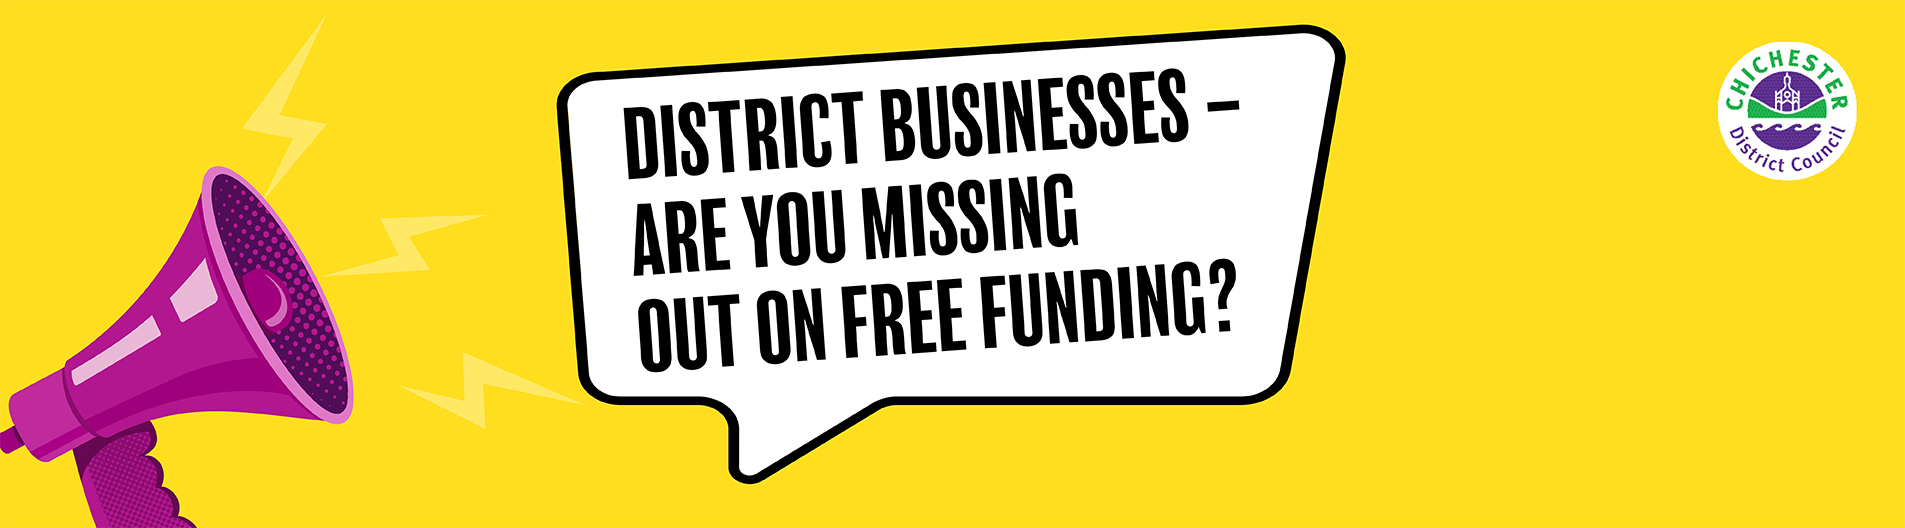 Grant funding for businesses